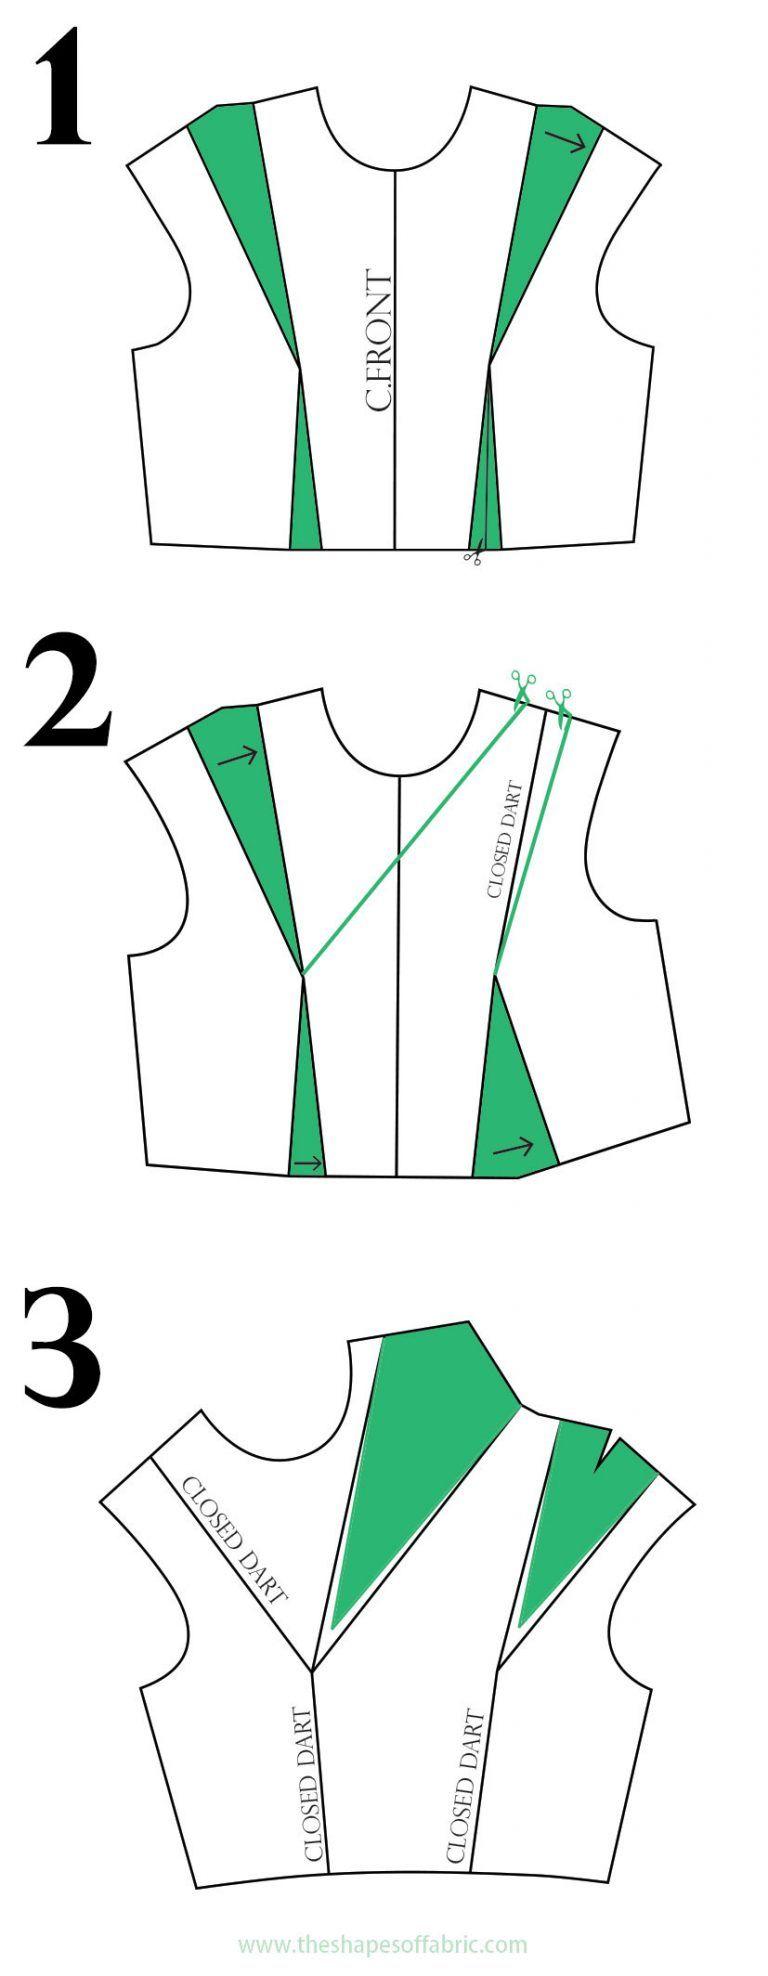 Dart manipulation basics - The Shapes of Fabric #fabricmanipulation